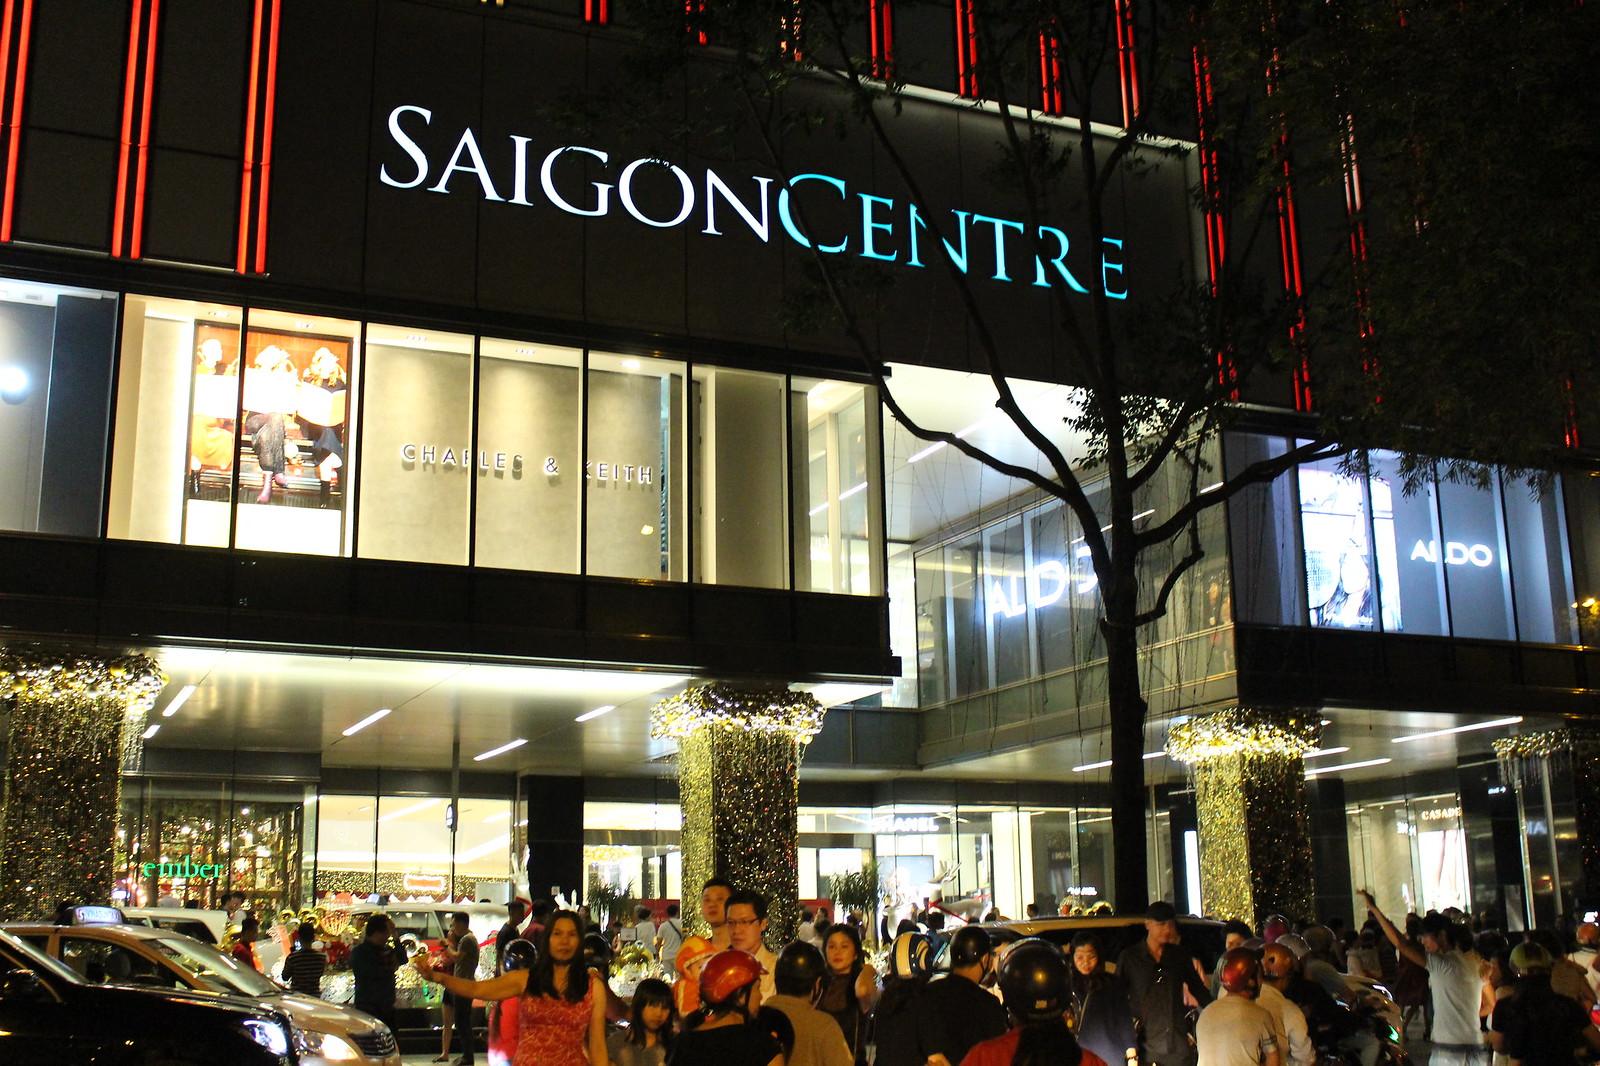 noel 2018 saigon SAIGON   Saigon Centre (Phase 2 3)   42 fl   193.7m   Completed  noel 2018 saigon